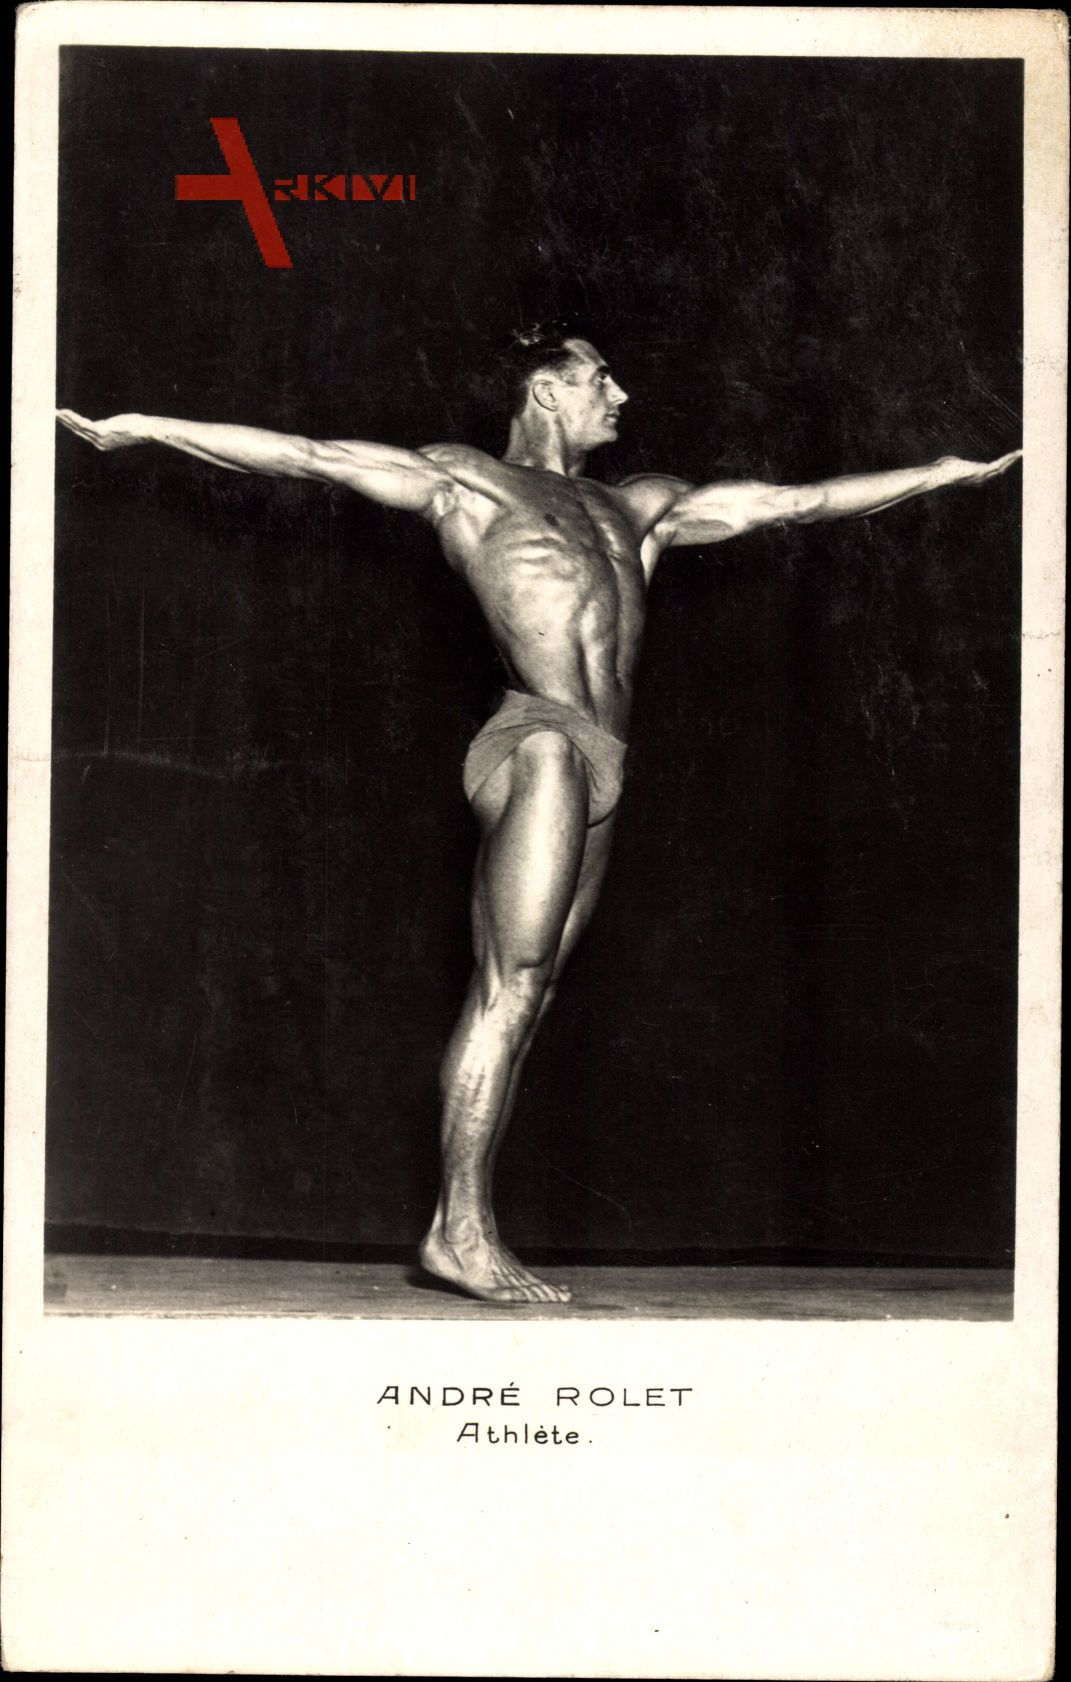 Adnré Rolet, Athlète, Bodybuilder, In Pose, Gewichtheber